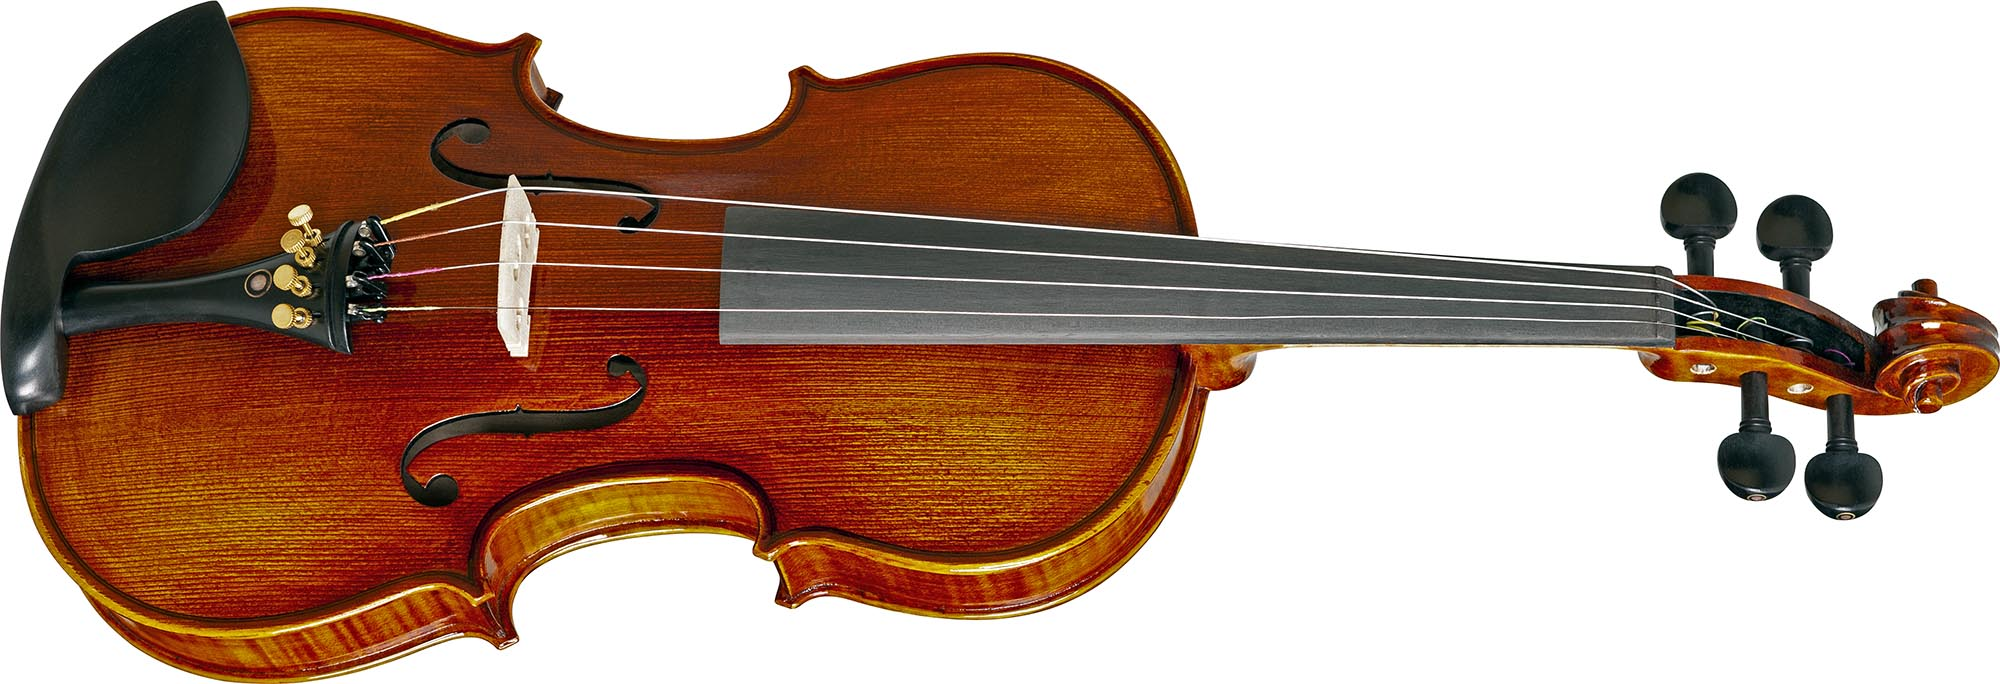 vk544 violino eagle vk544 visao frontal